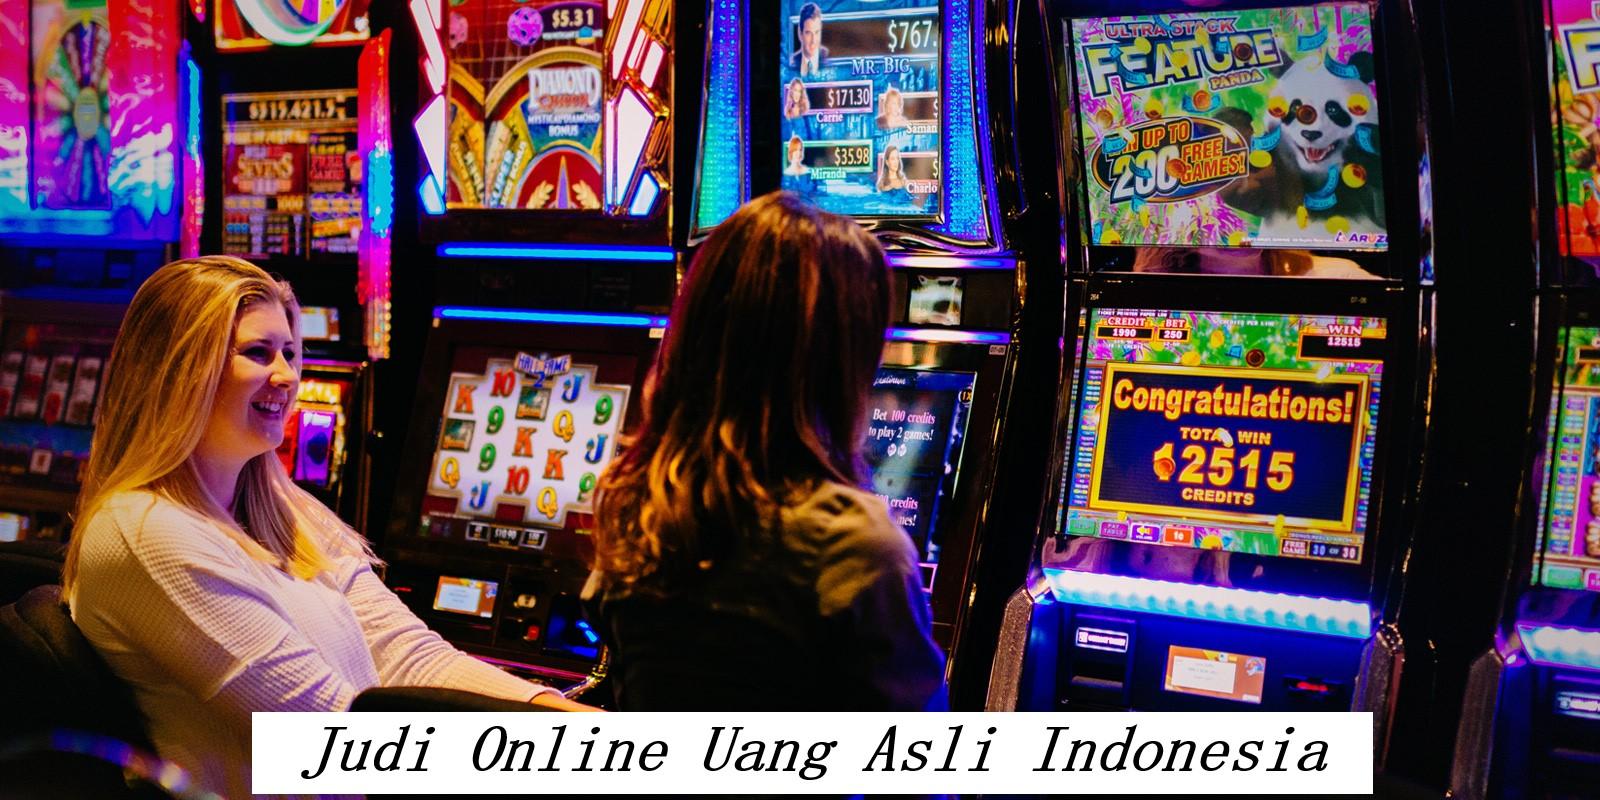 Judi Online Uang Asli Indonesia